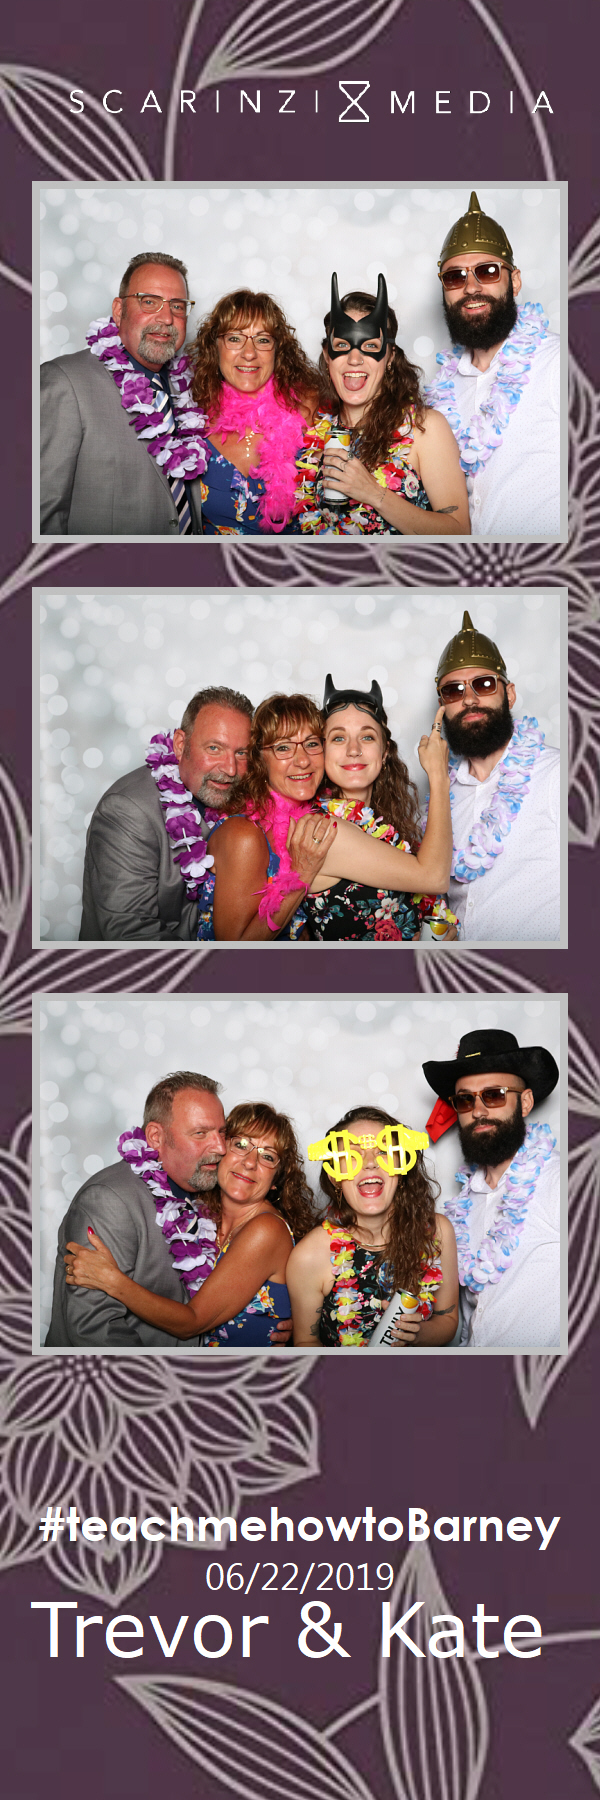 2019.06.22 - Barney Wedding PHOTOBOOTH14.jpg